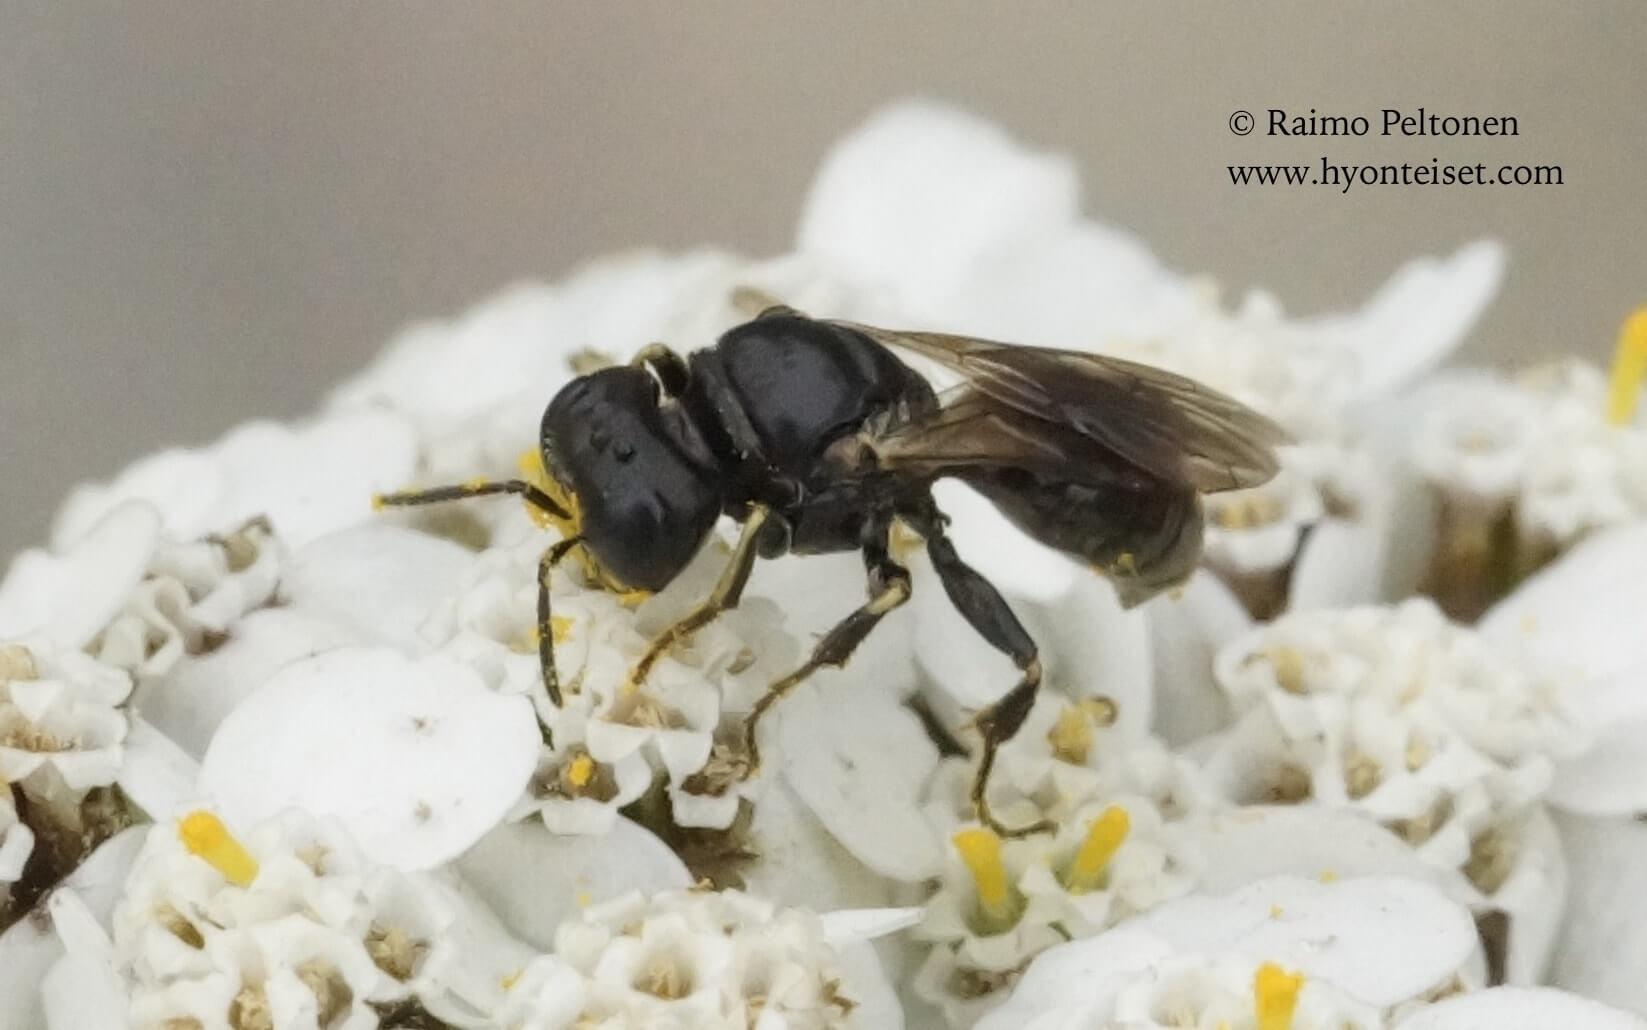 Lindenius albilabris-sysihukka, naaras (det. Juho Paukkunen)